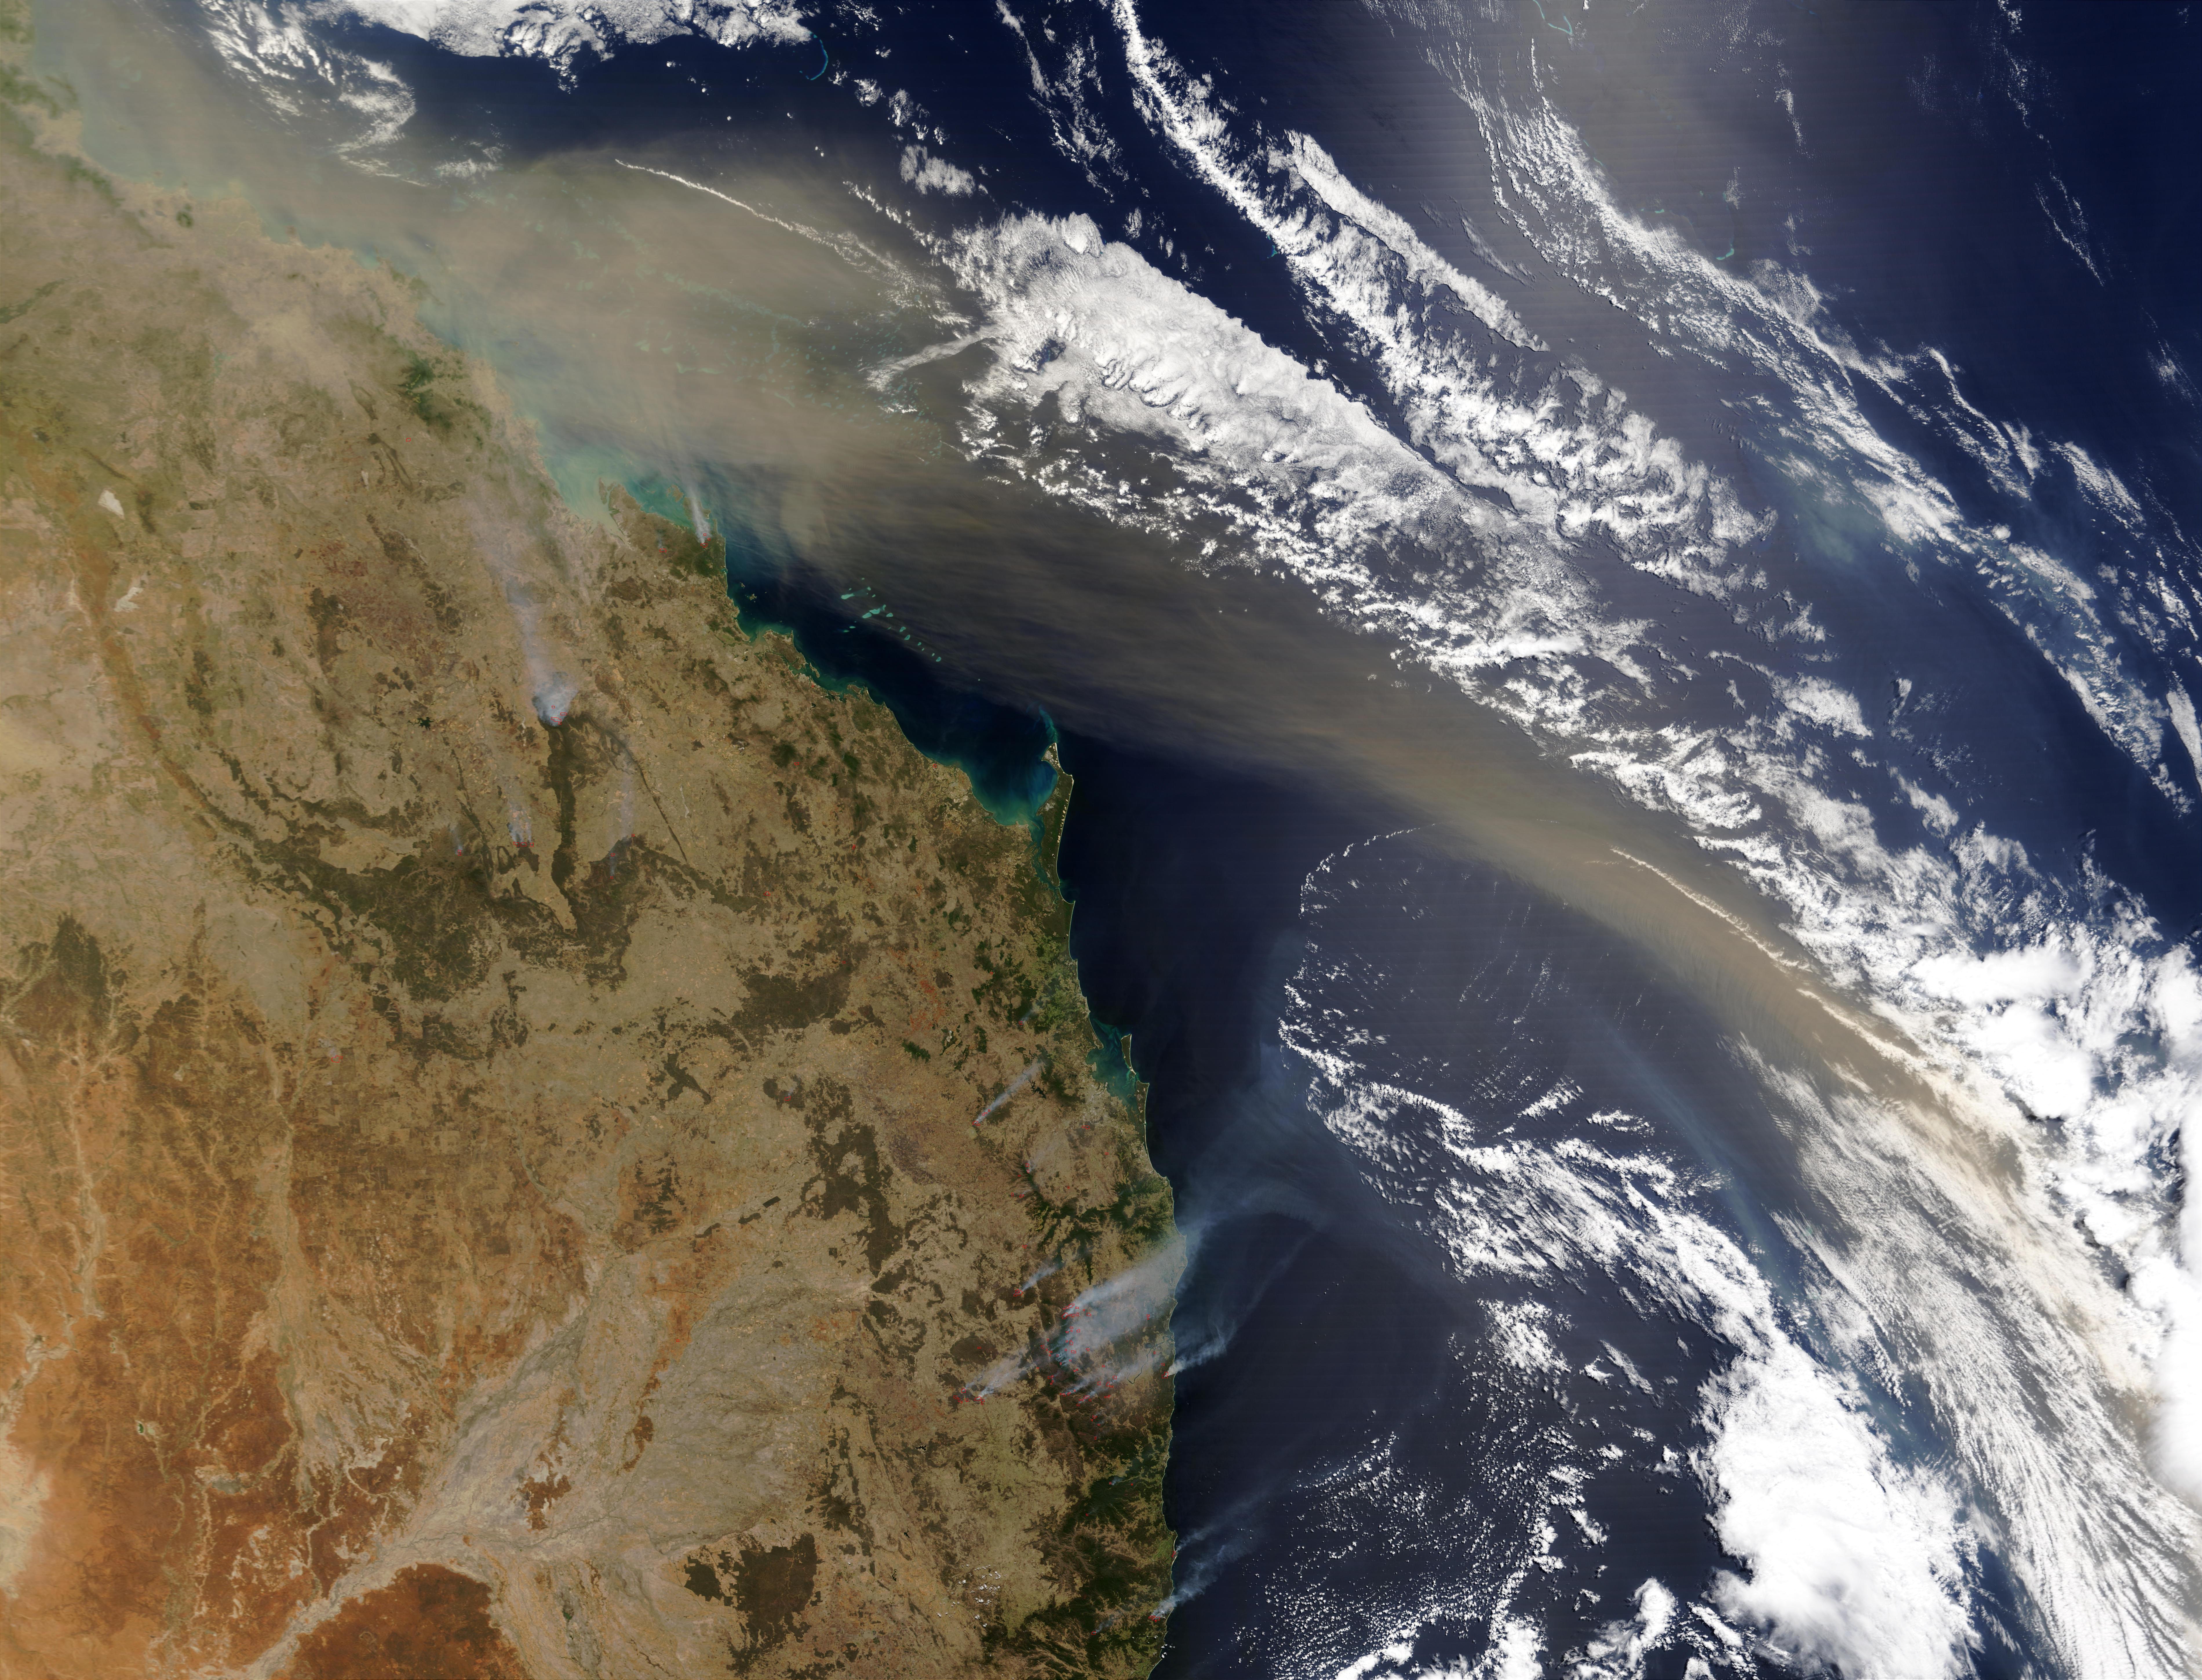 Penacho de polvorada cerca de la costa este de Australia